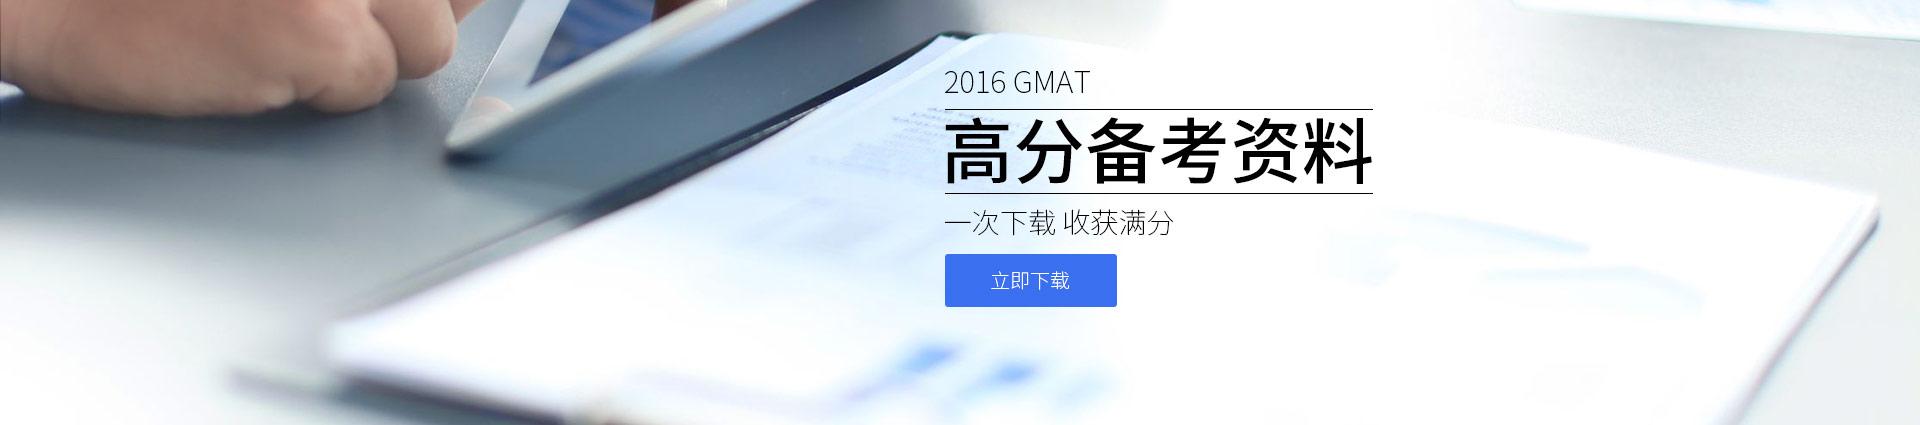 2016GMAT高分备考资料